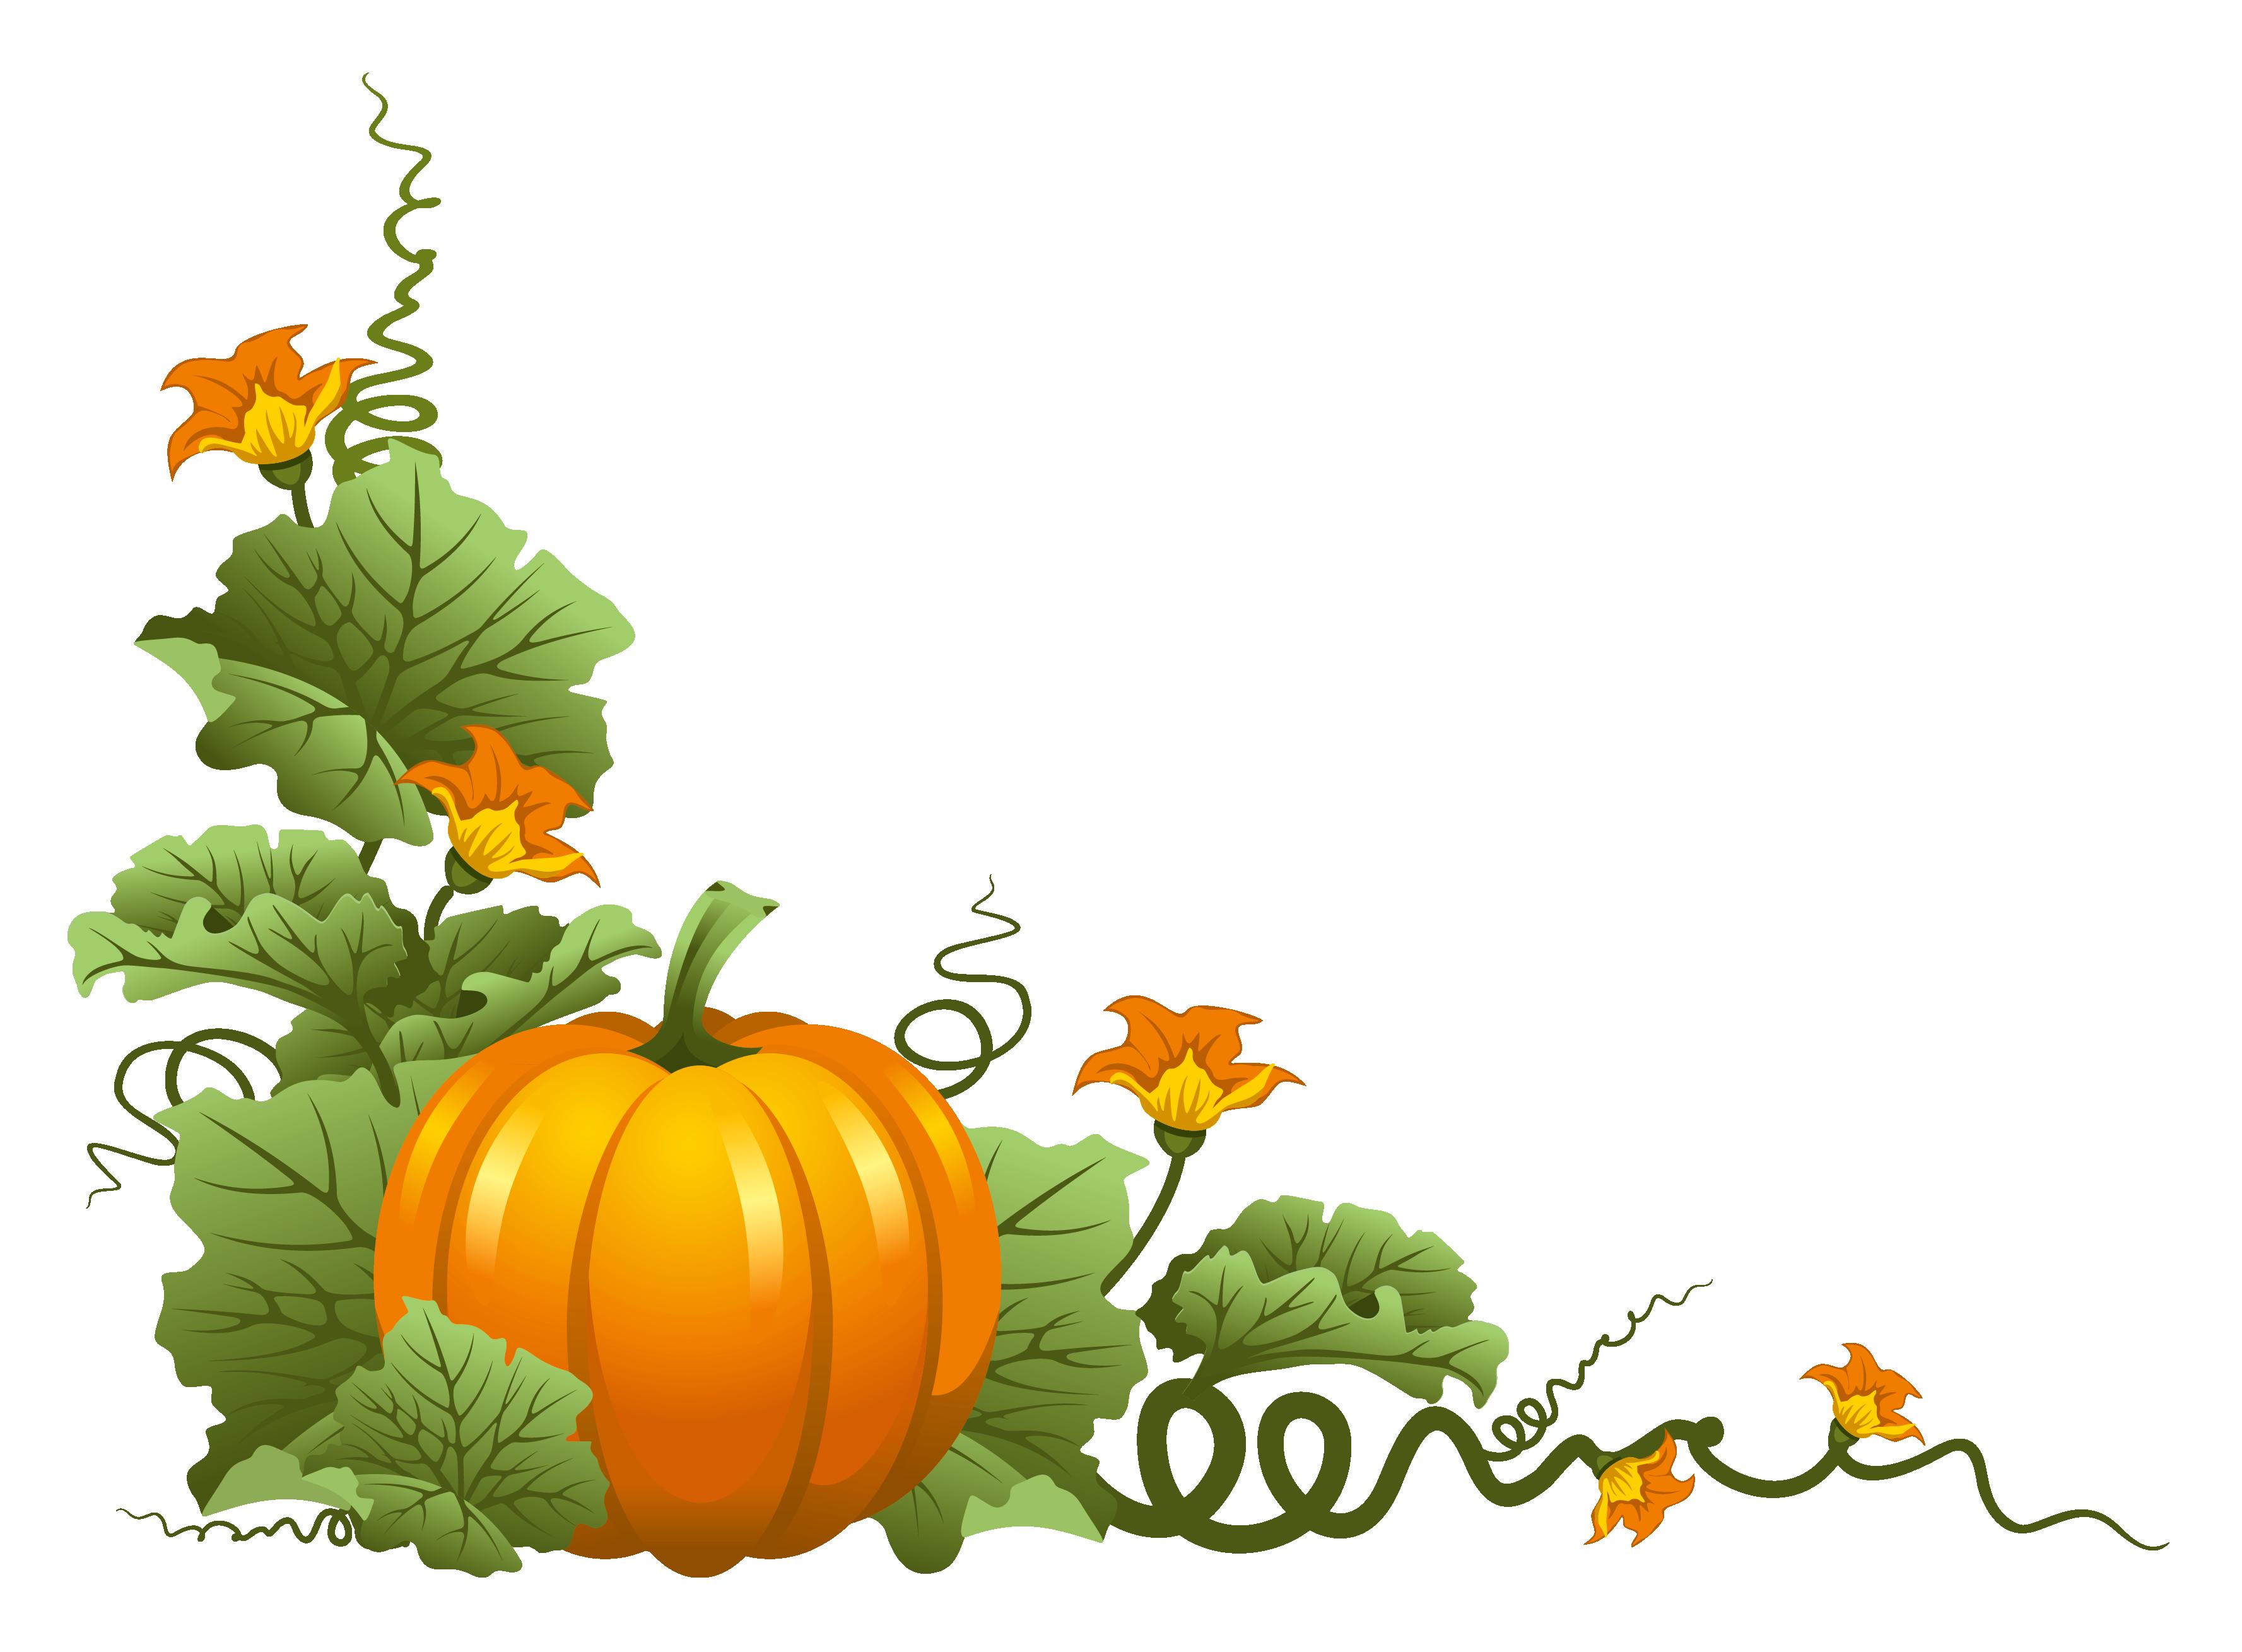 3554x2619 Free Pumpkin Png Pumpkin Decor Png Clipart Fall Pumpkins